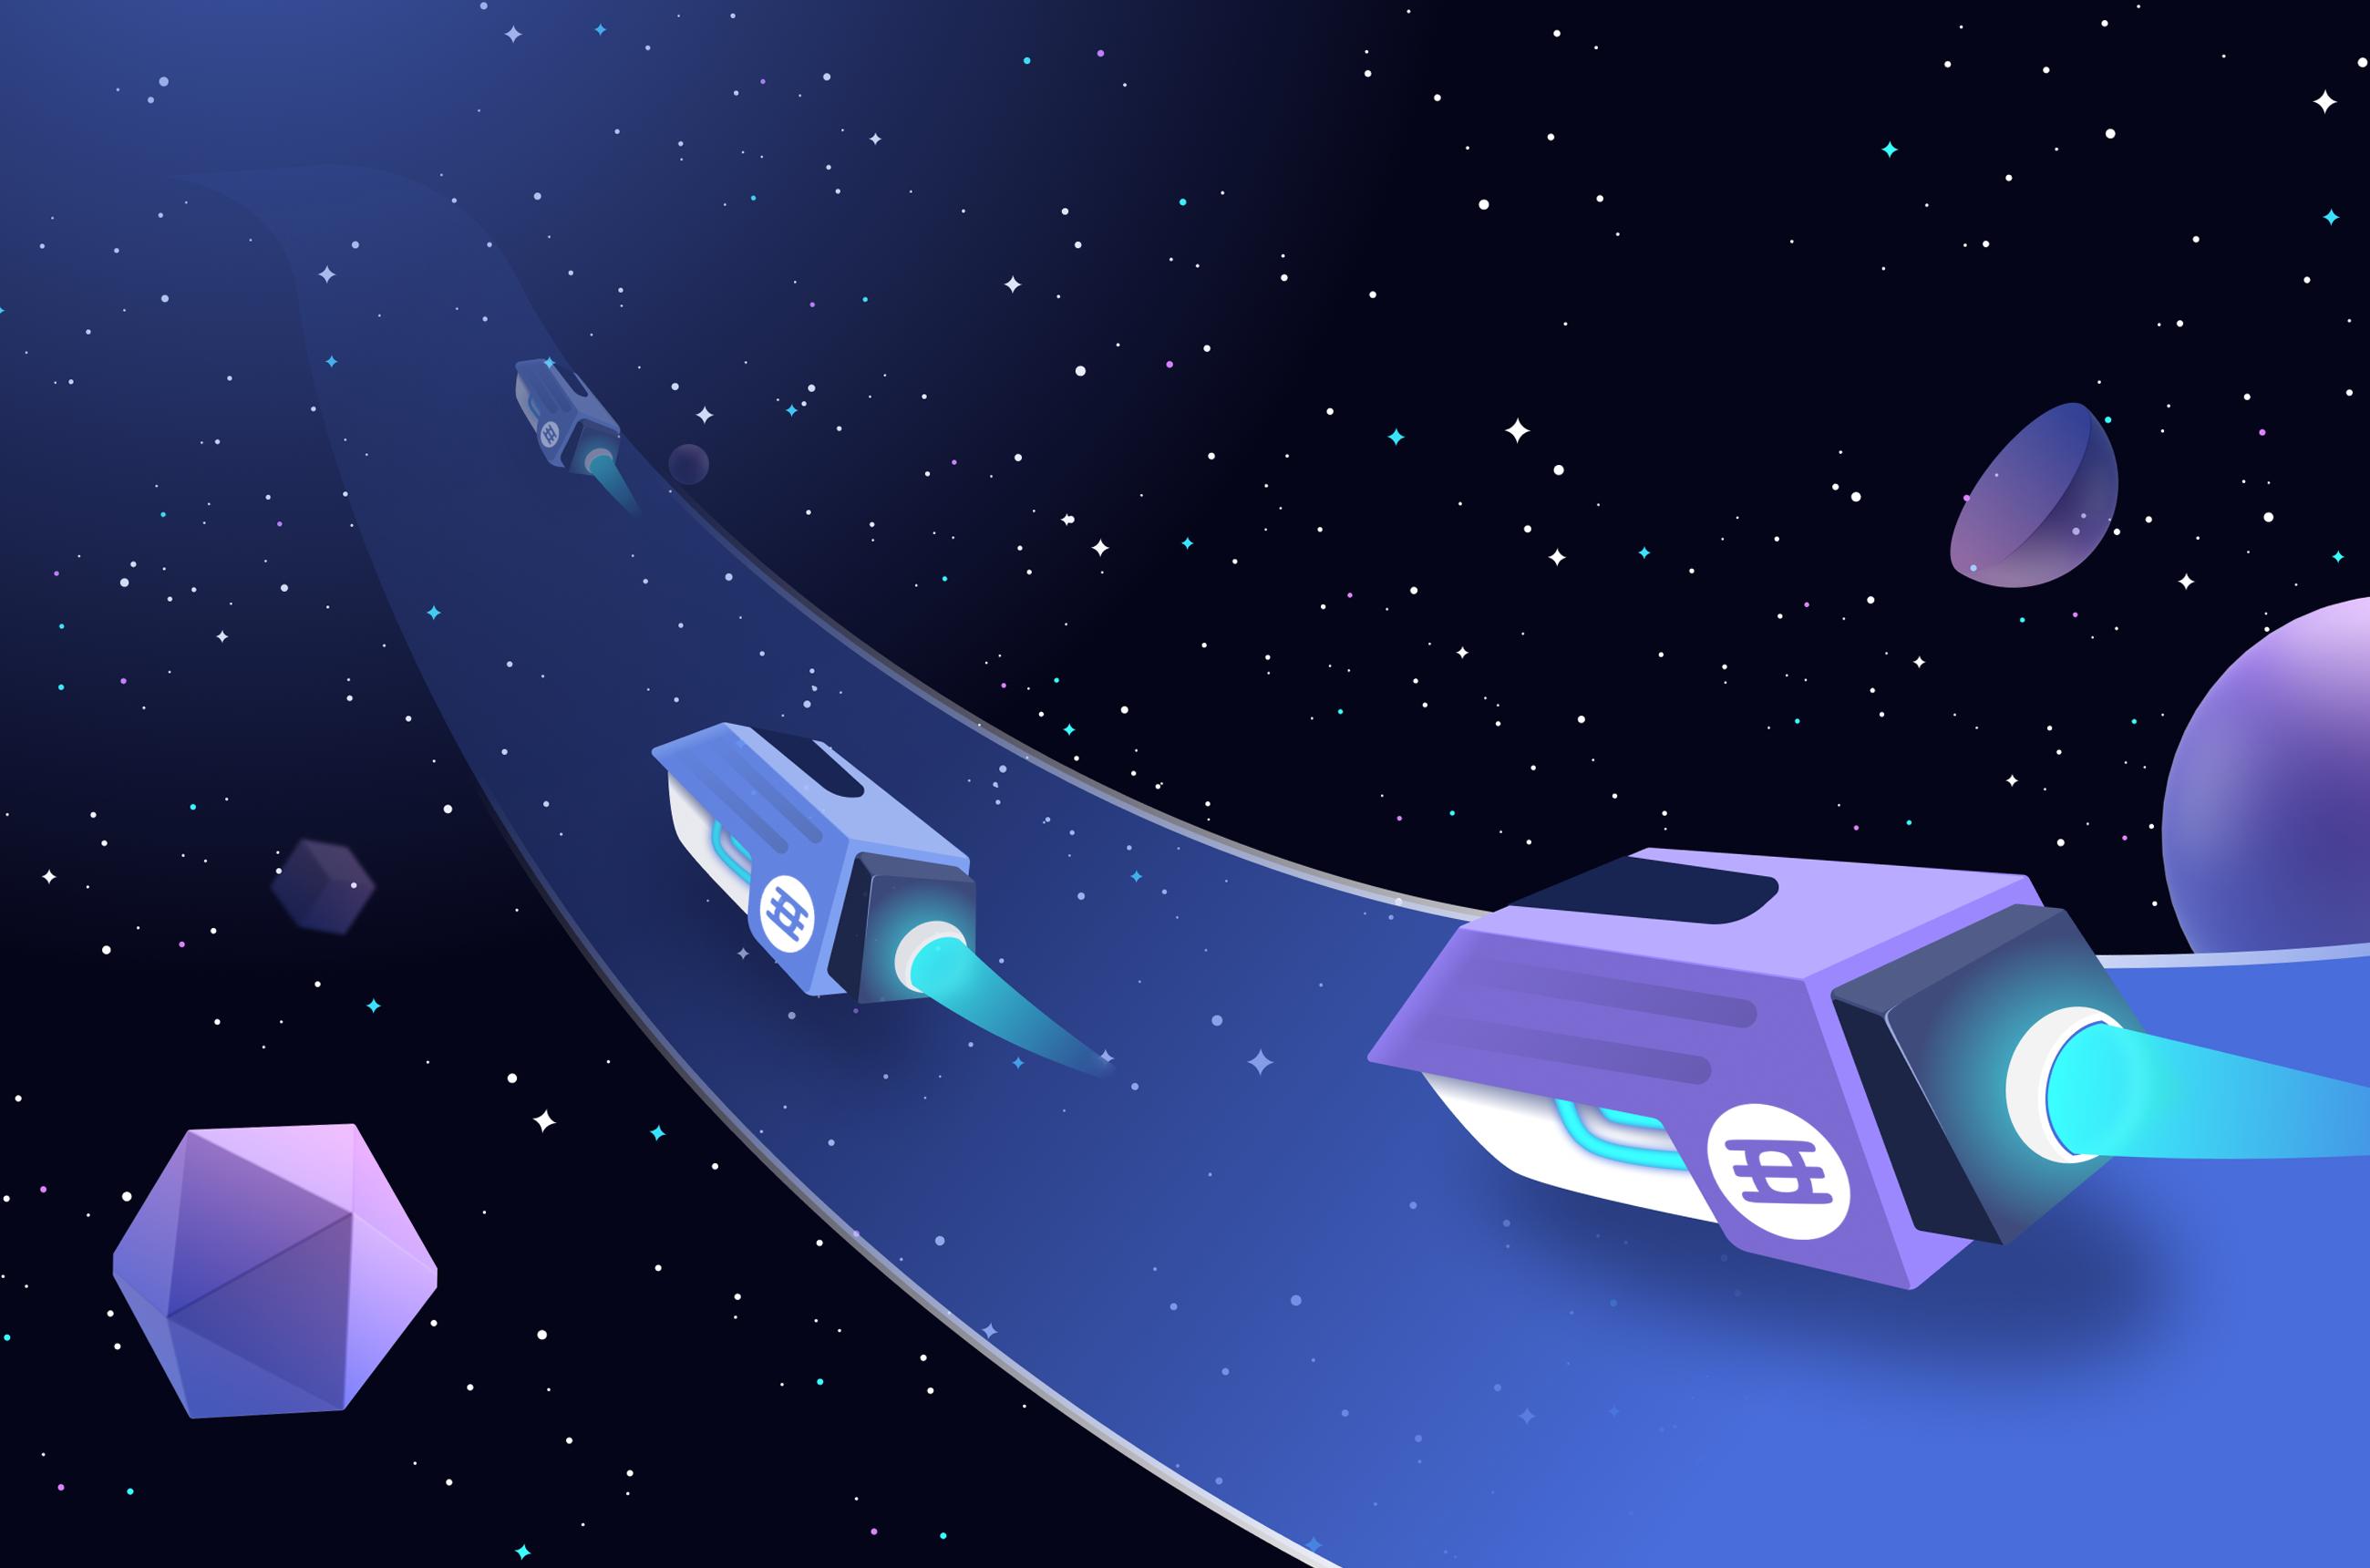 Efinity에 대한 NFT 민폐 및 배치 트랜잭션 최적화